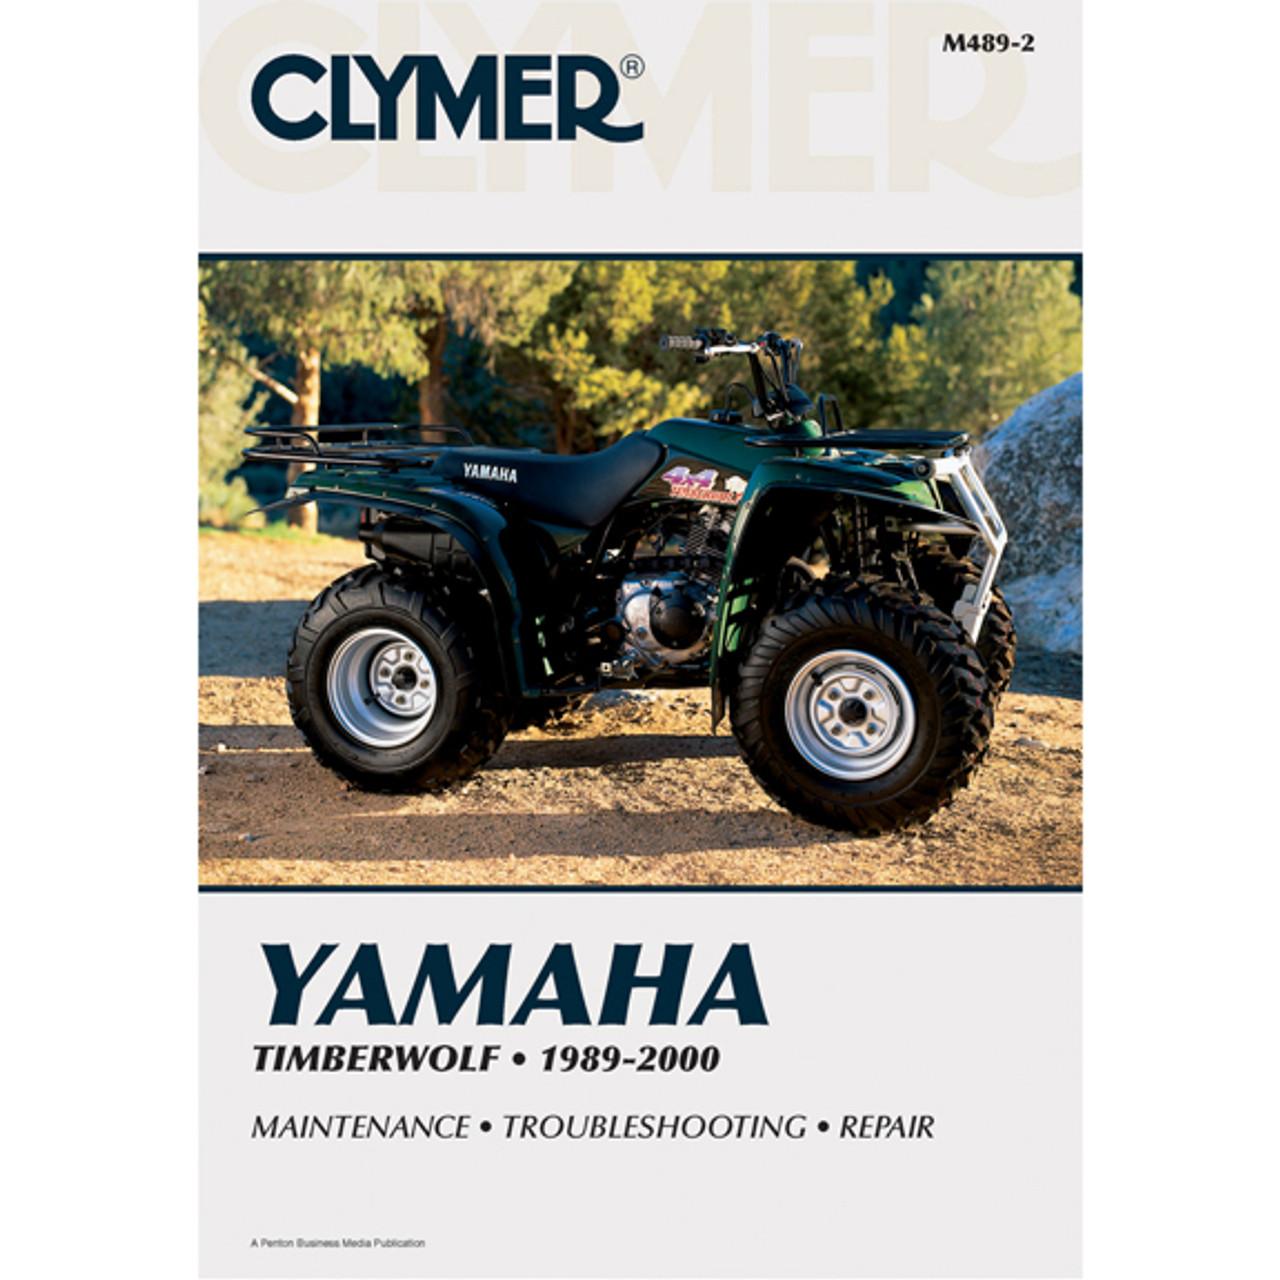 Clymer M225 Offroad Manuals